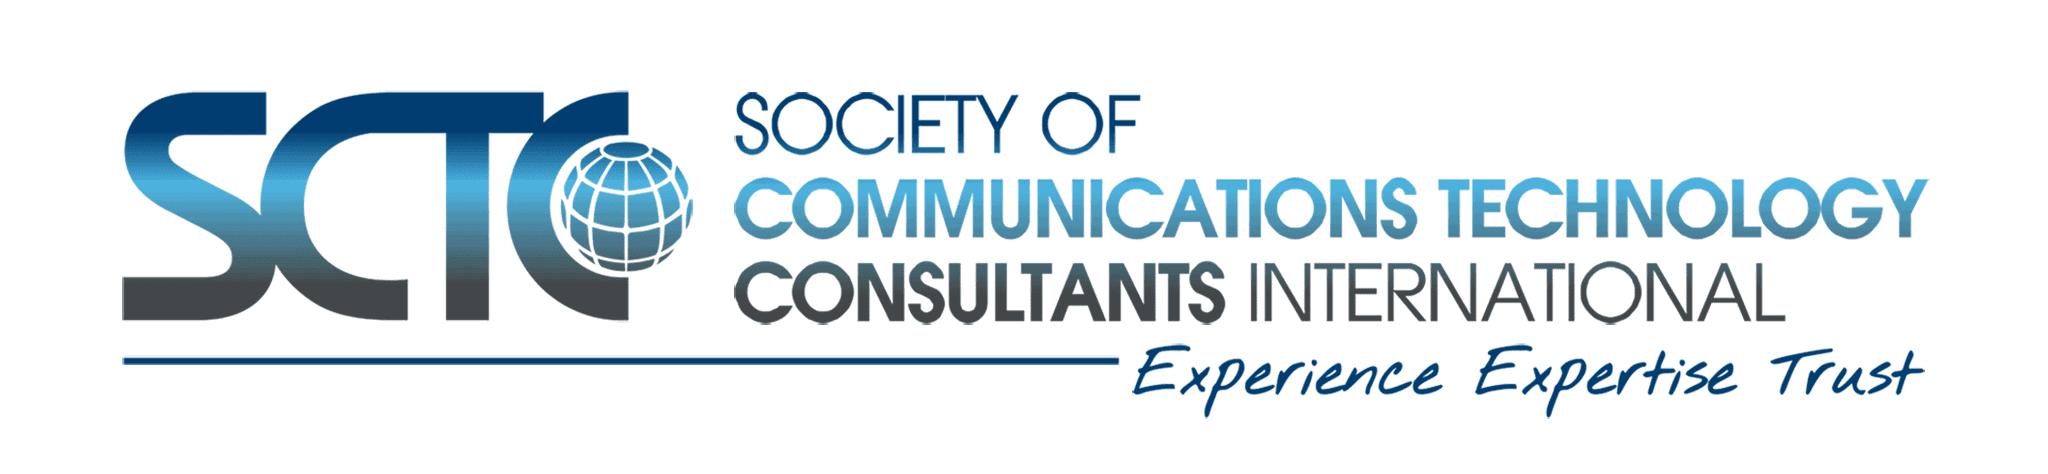 Society of Communications Technology Consultants International logo